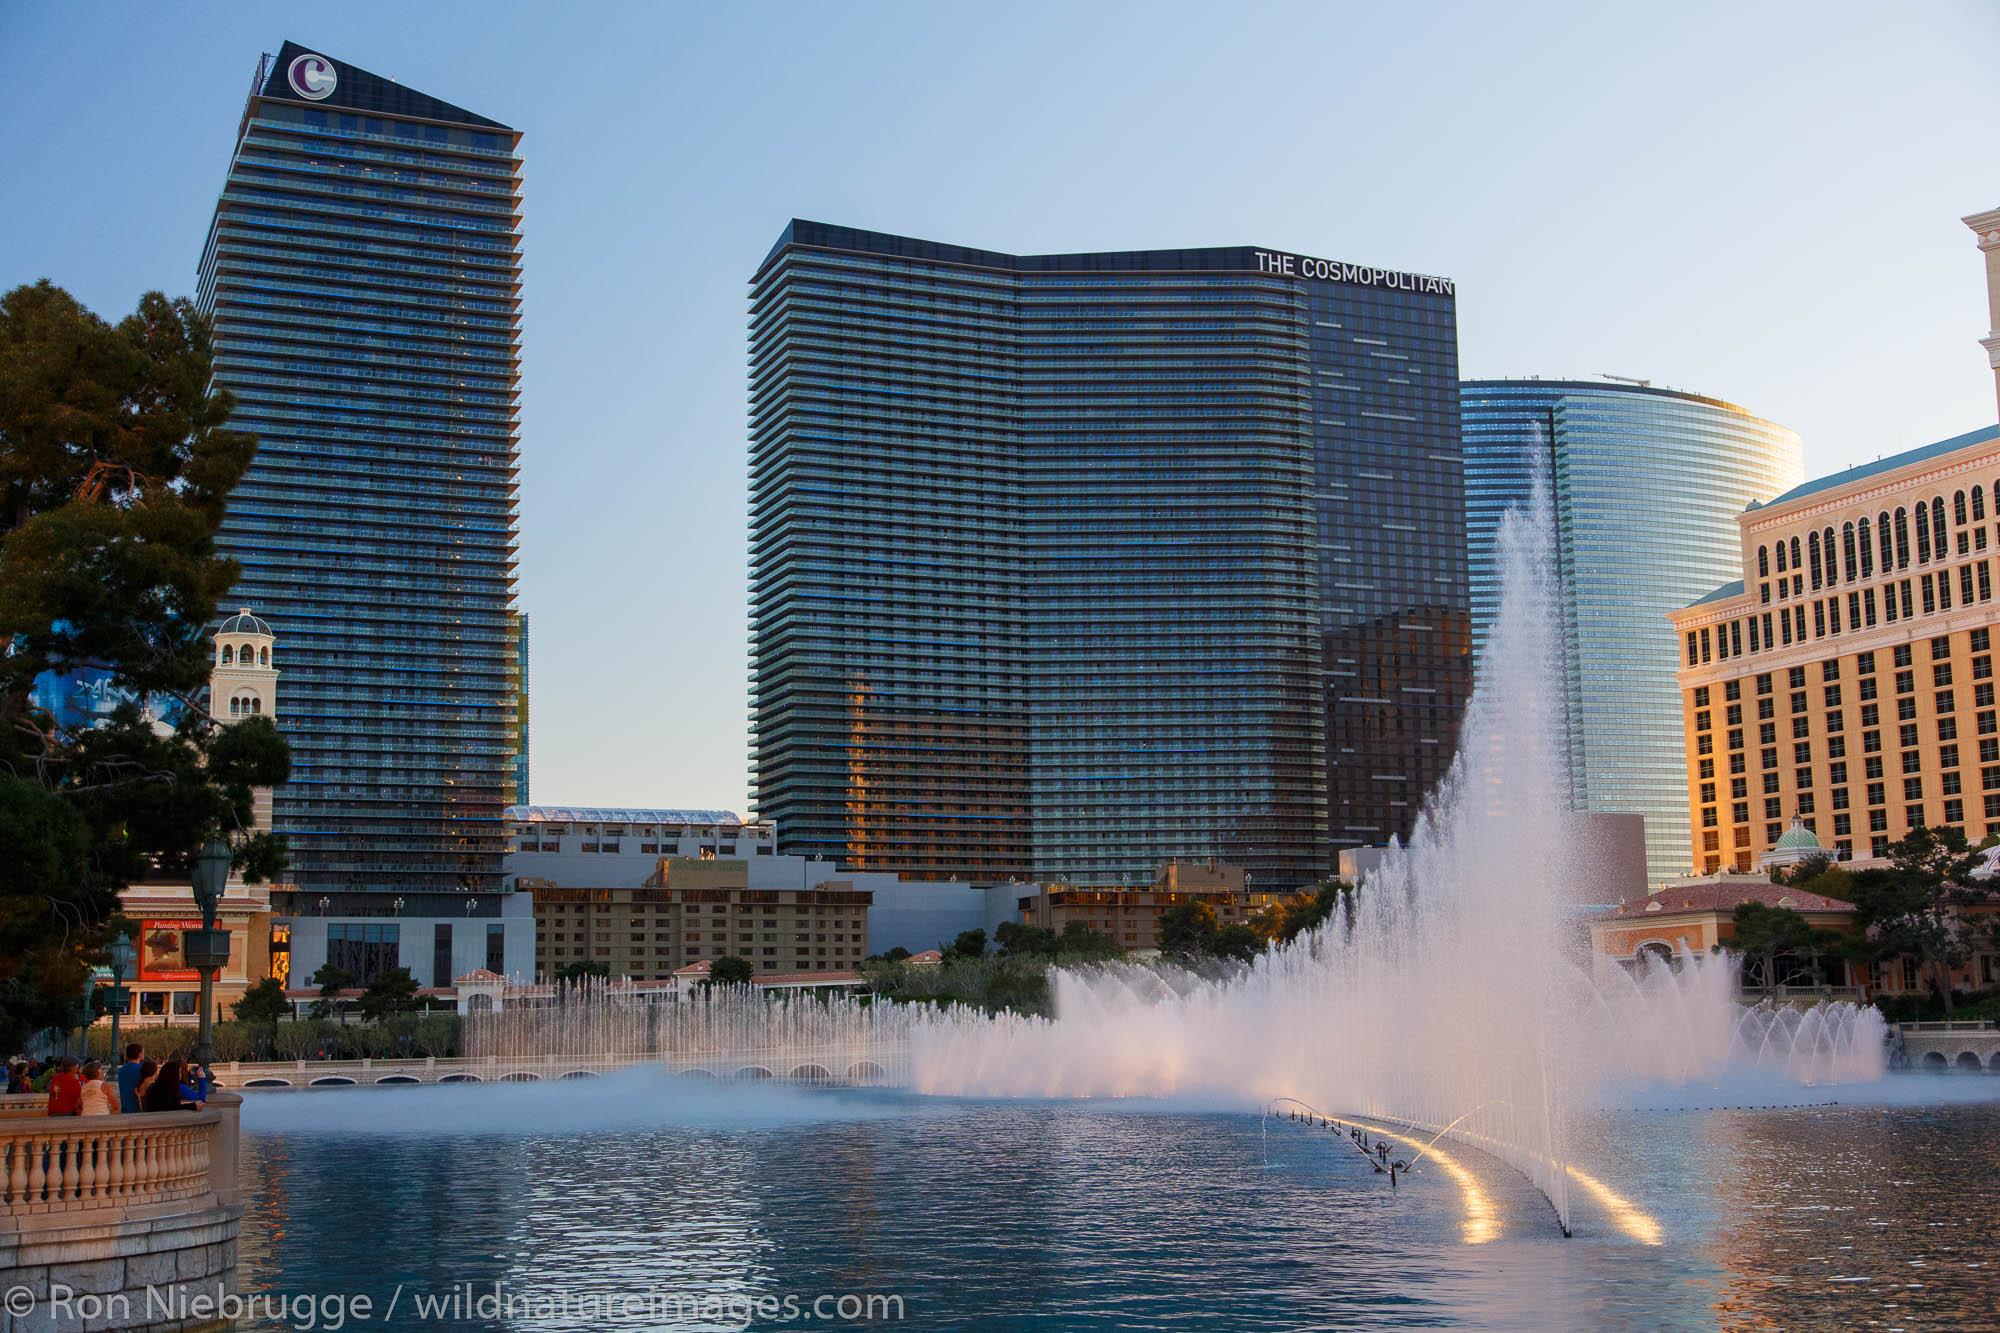 The Bellagio Fountains and The Cosmopolitan of Las Vegas Resort and Casino, Las Vegas, Nevada.